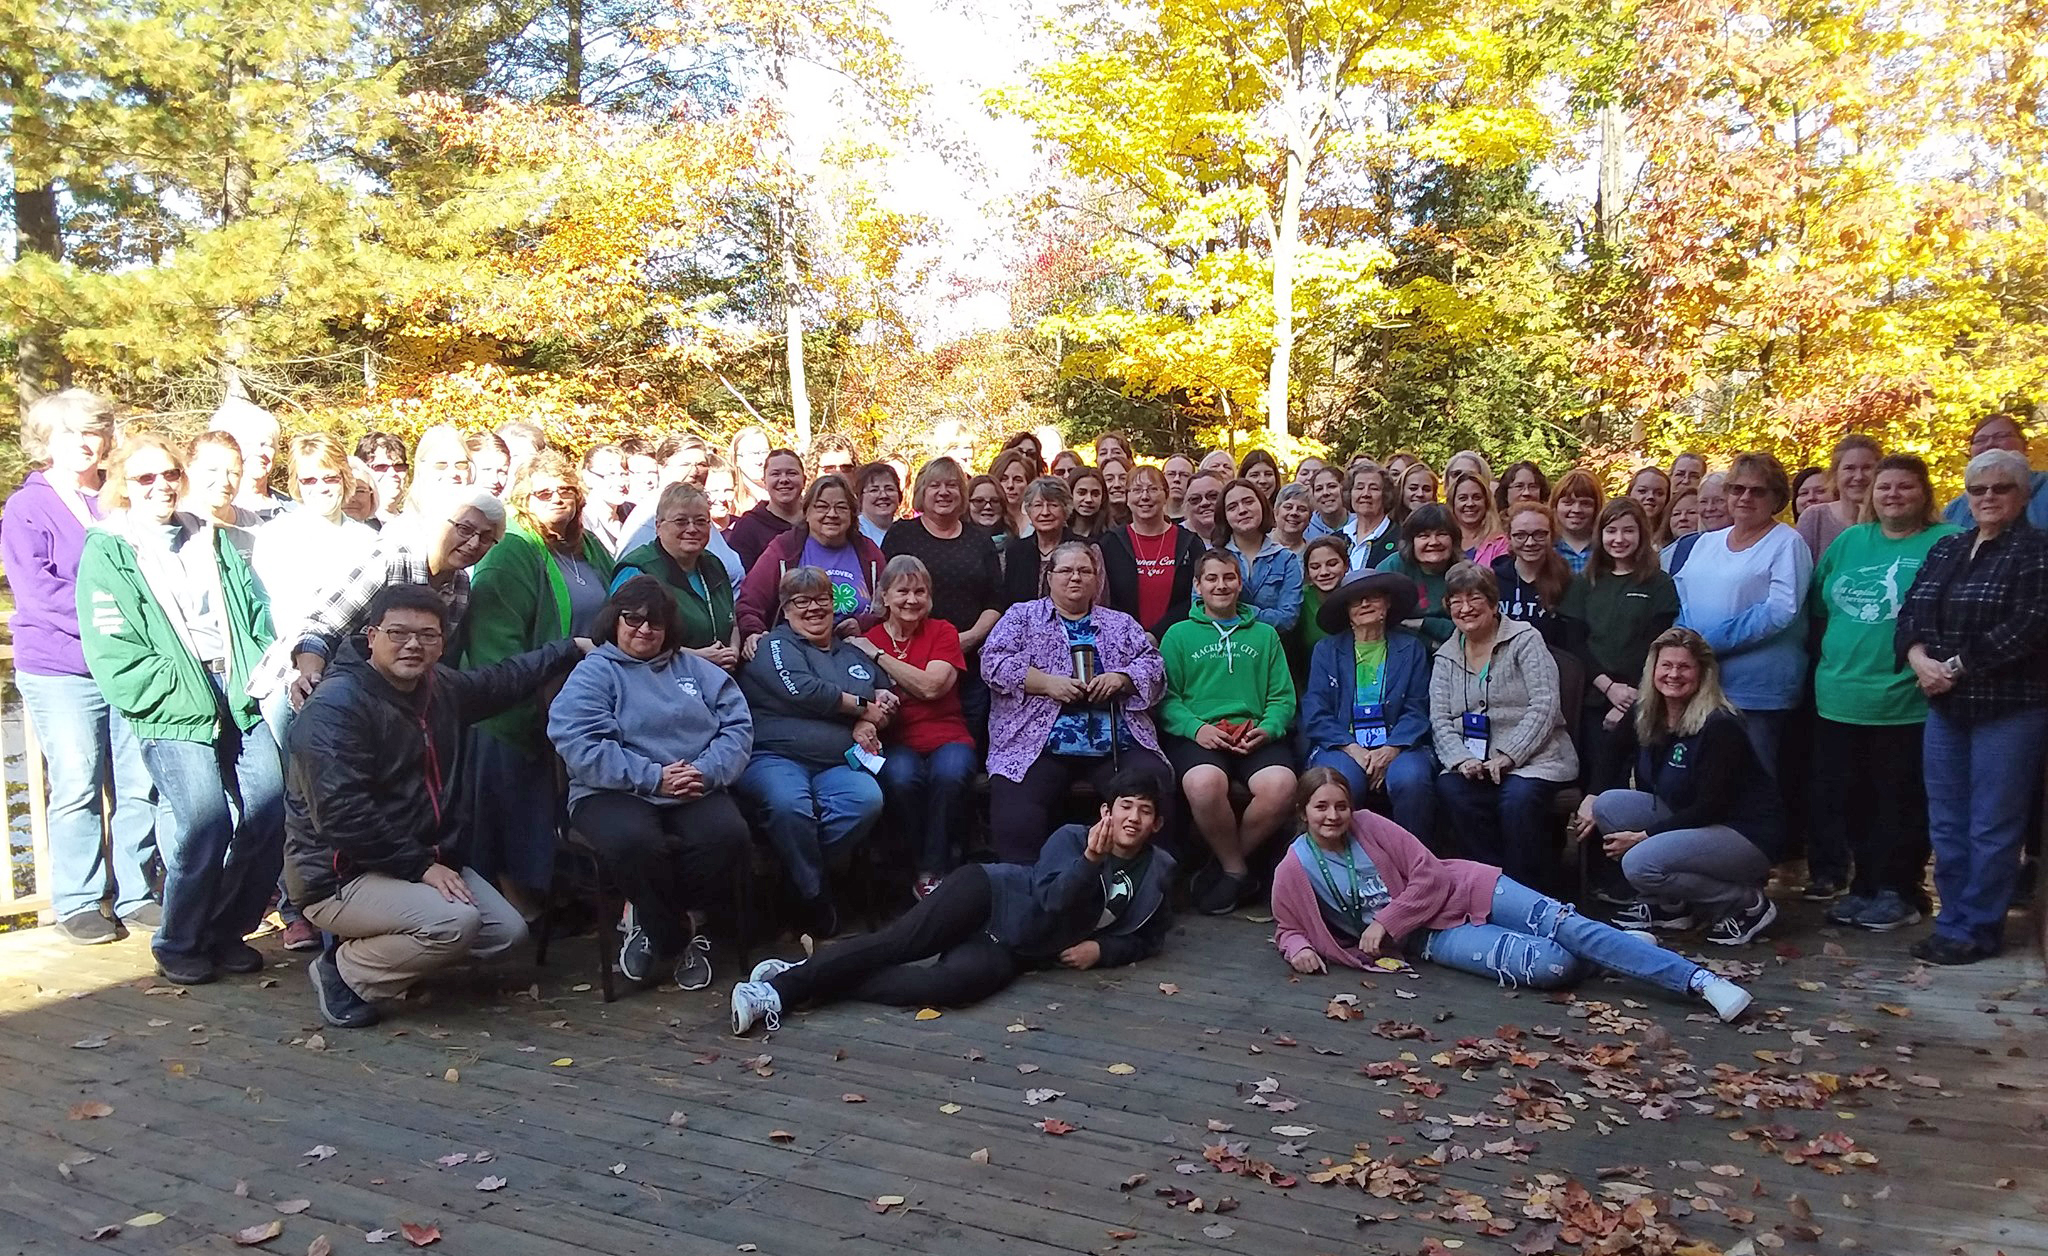 Over 100 participants at Kettunen Center